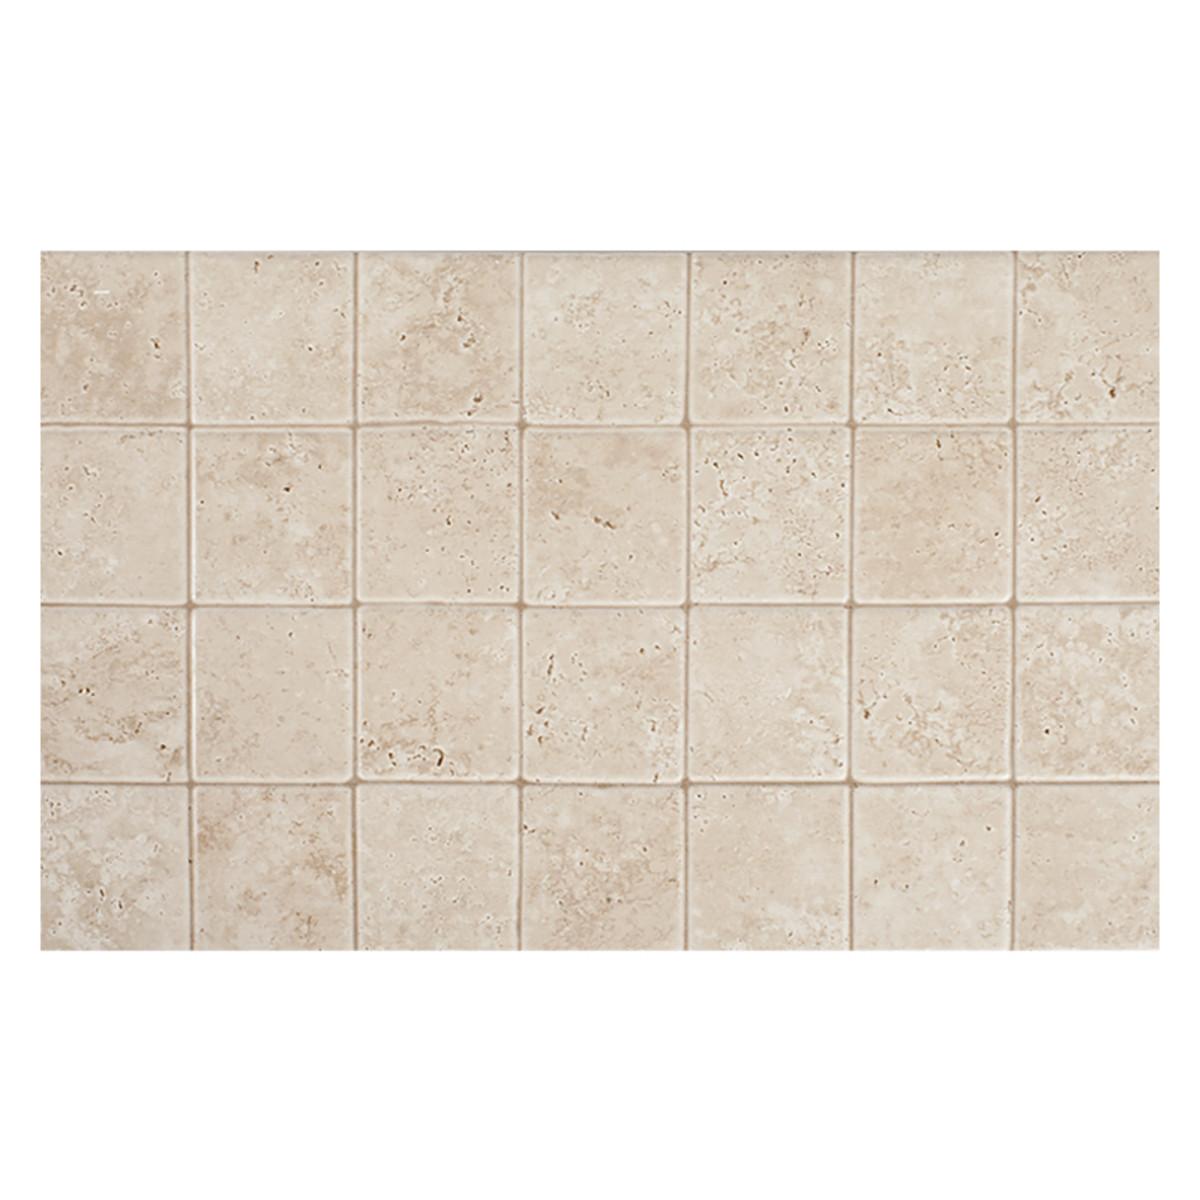 Плитка настенная Bohemia Mosaic Cream 25x40 см 1 м2